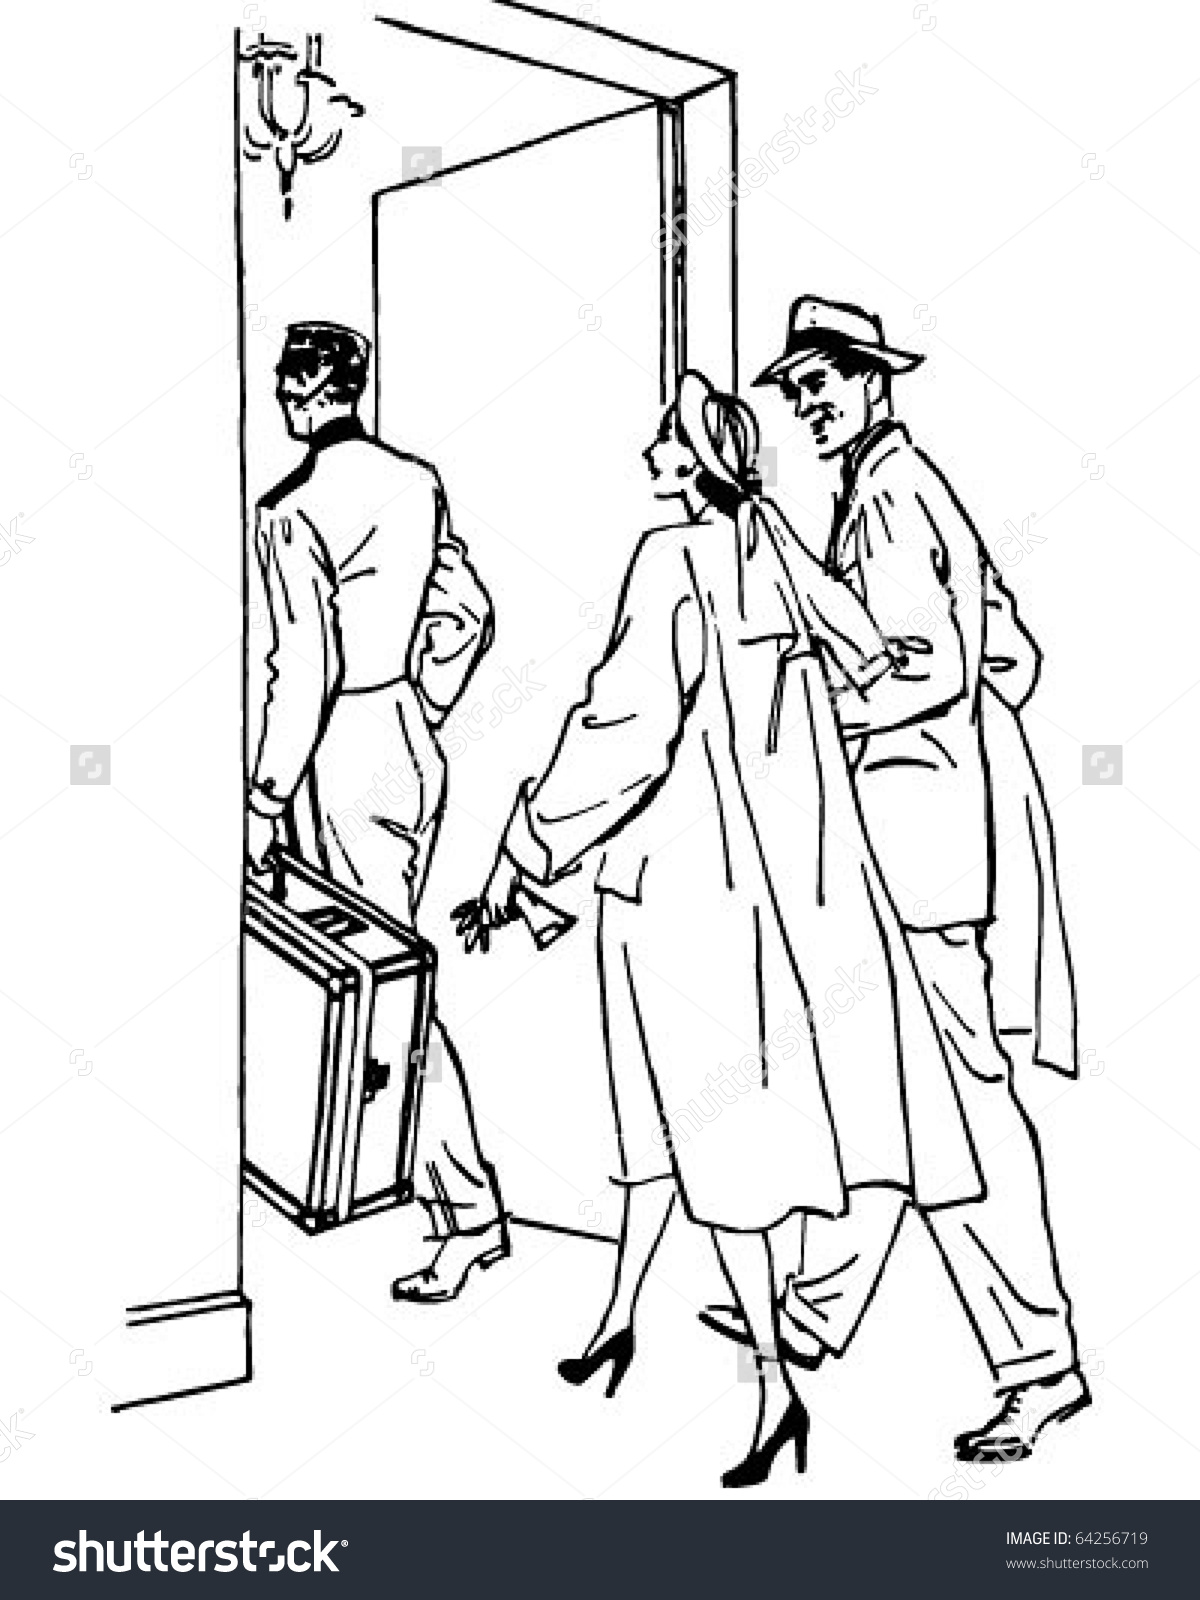 Travelers Entering Hotel.